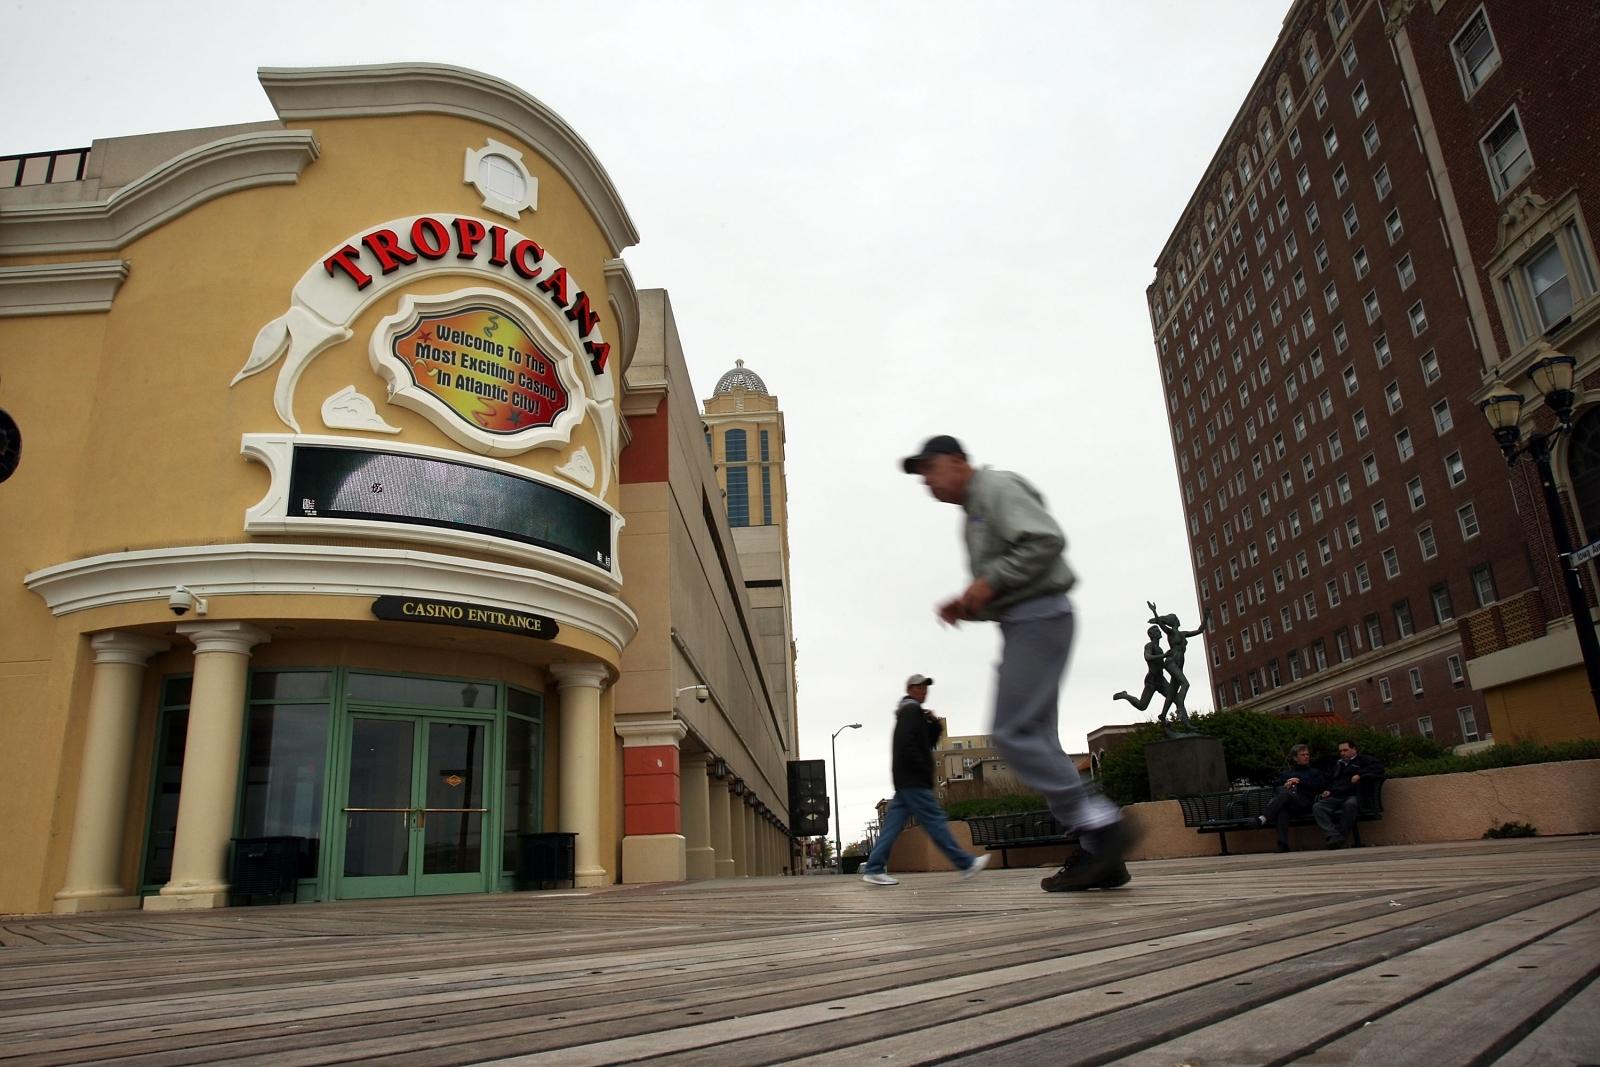 Tropicana Casino in Atlantic City, NJ